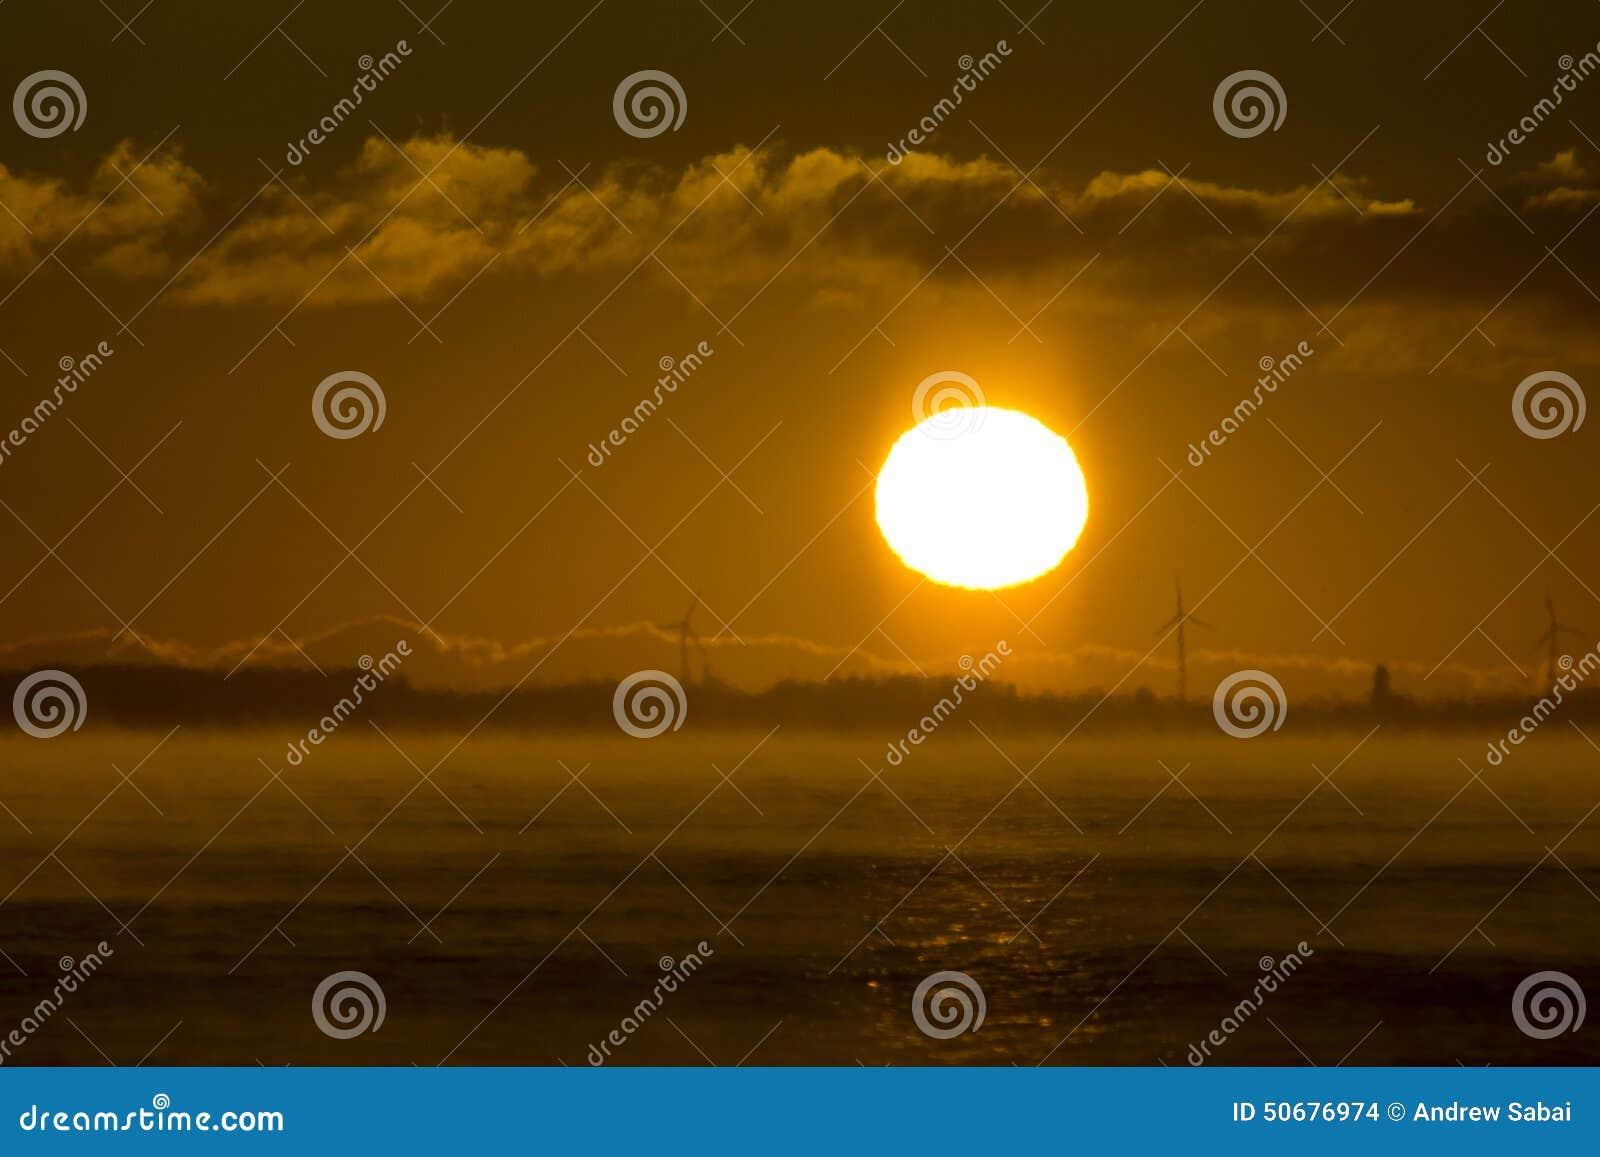 Download 风轮机日出 库存照片. 图片 包括有 温室, 有雾, 作用, 云彩, 日落, 温暖, 干净, 涡轮, 能源 - 50676974